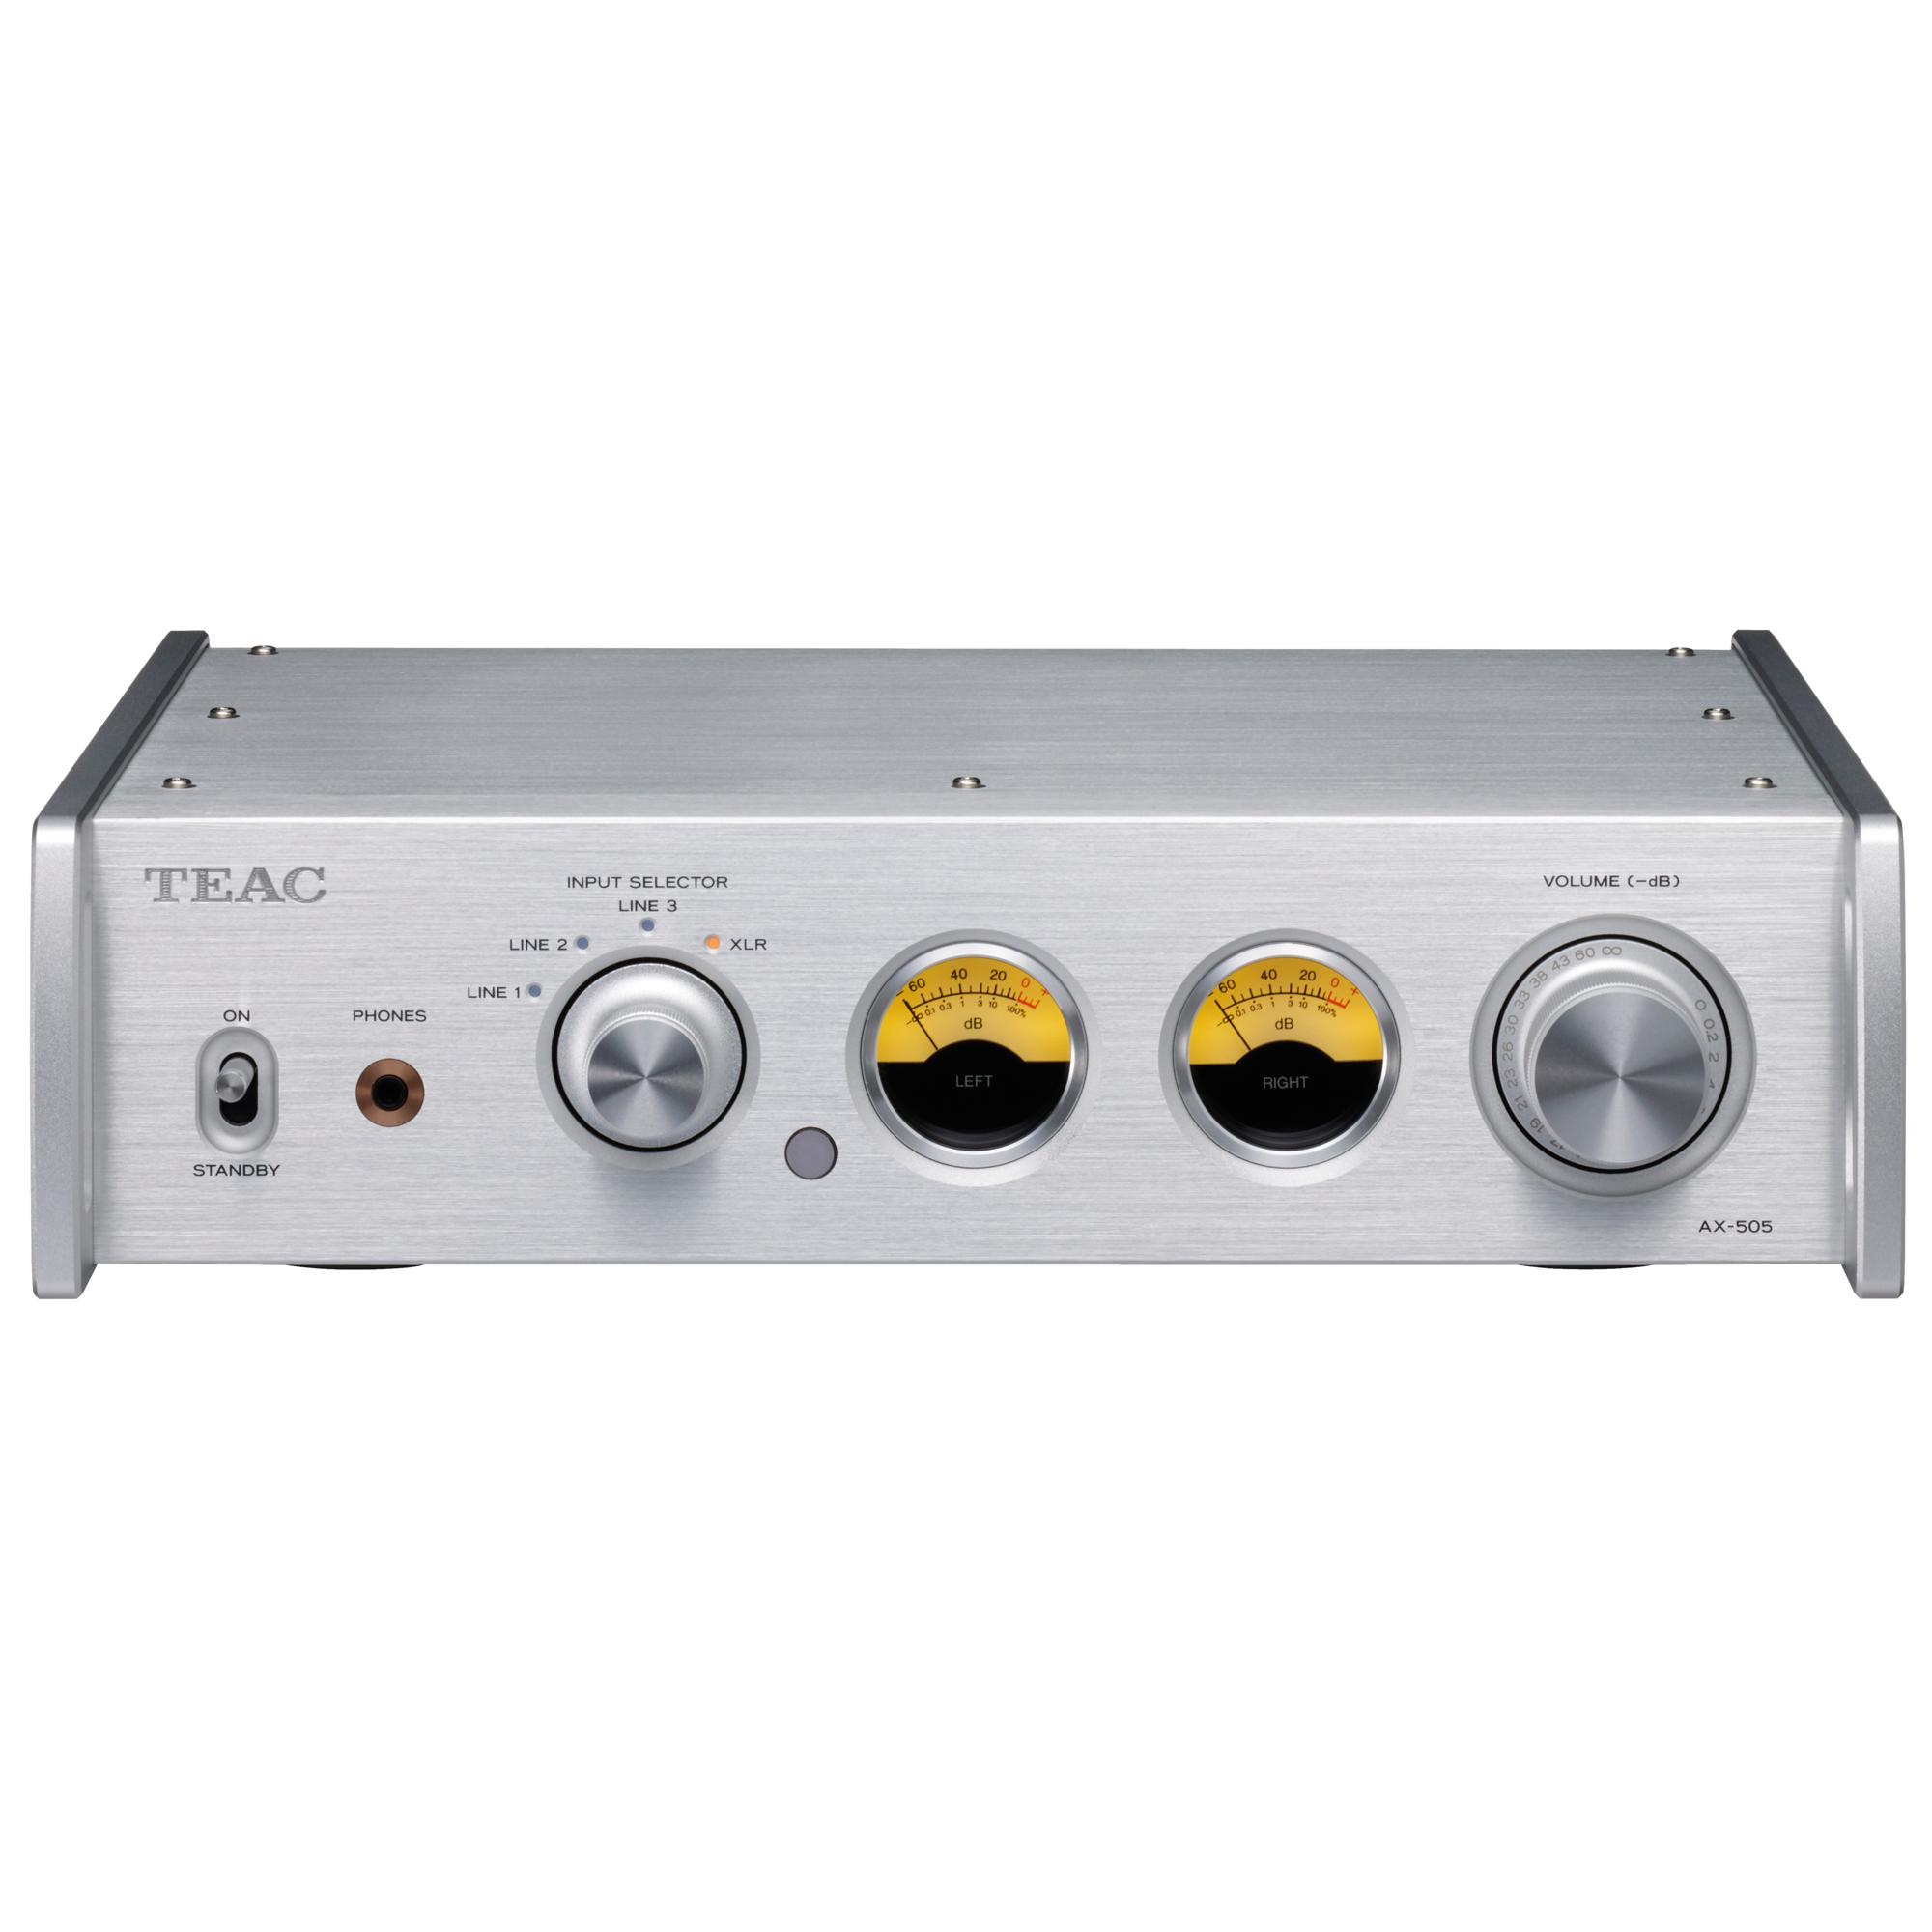 Teac AX-505 silber Stereo-Endverstärker 101135